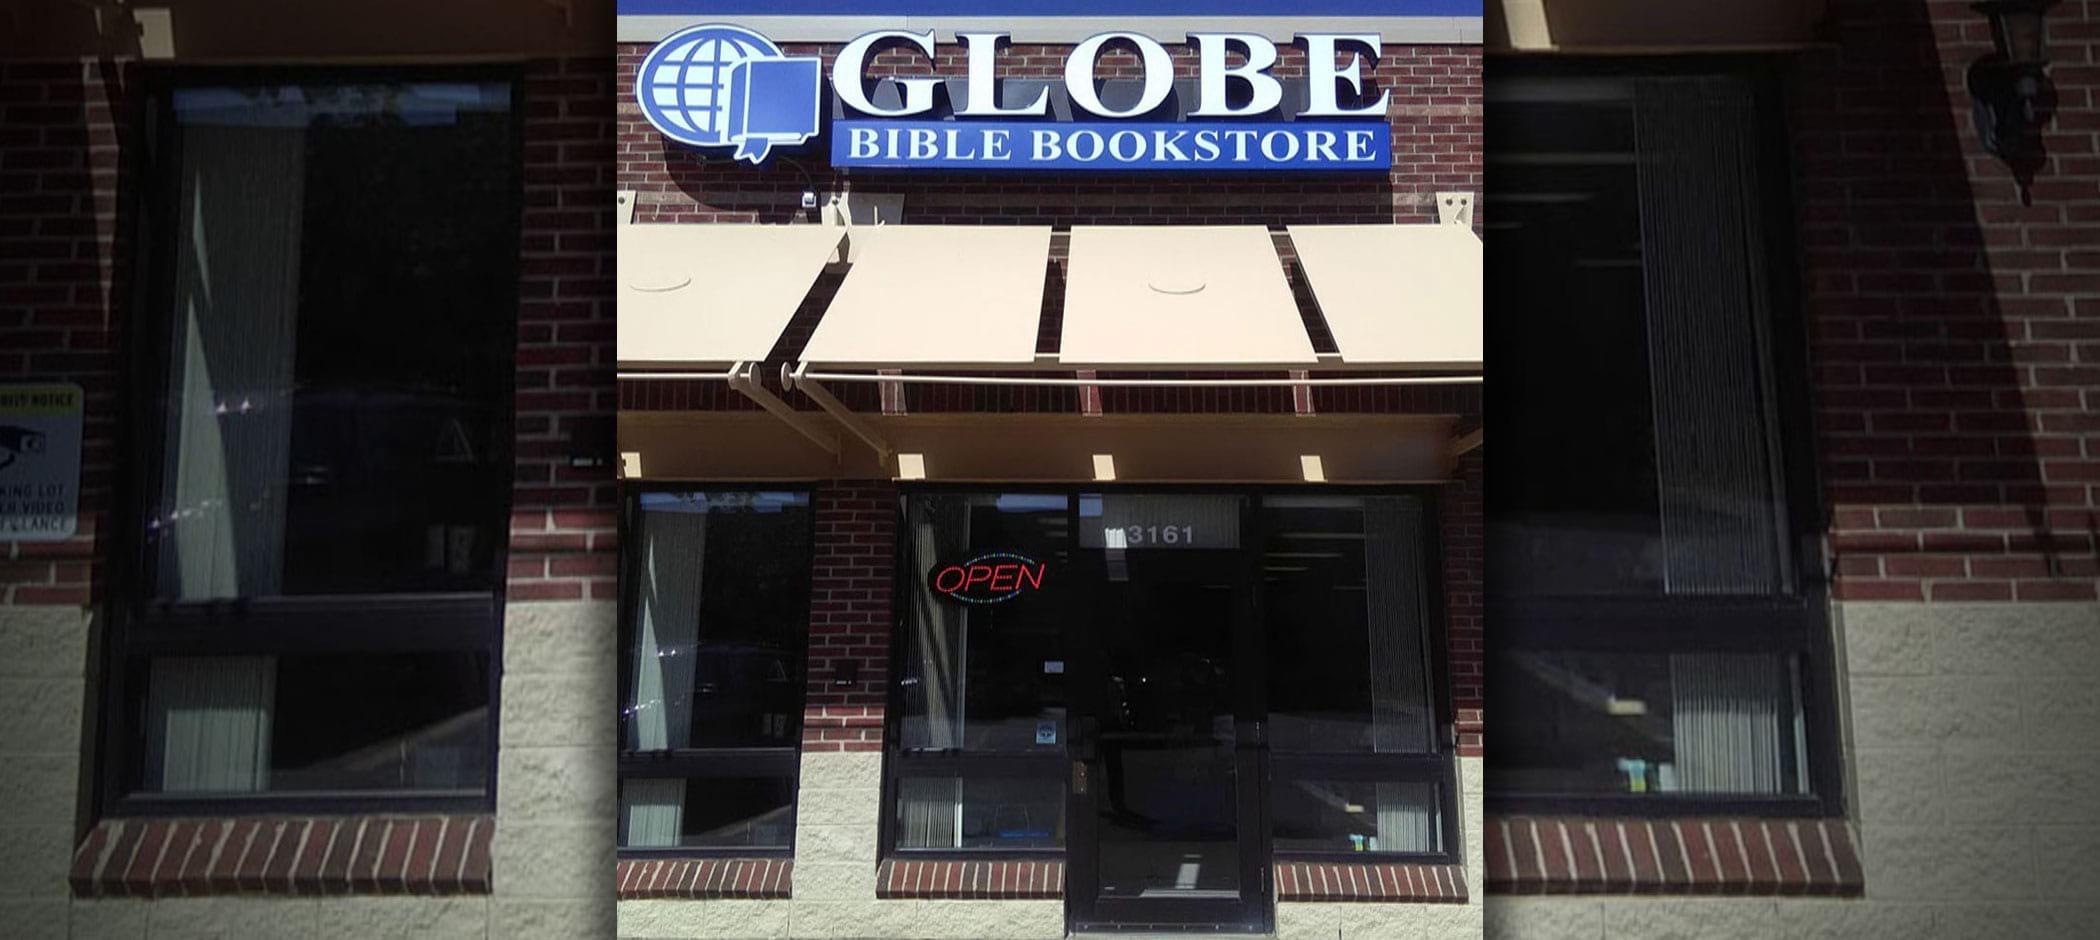 Globe Bible Bookstore   VisitDetroit com